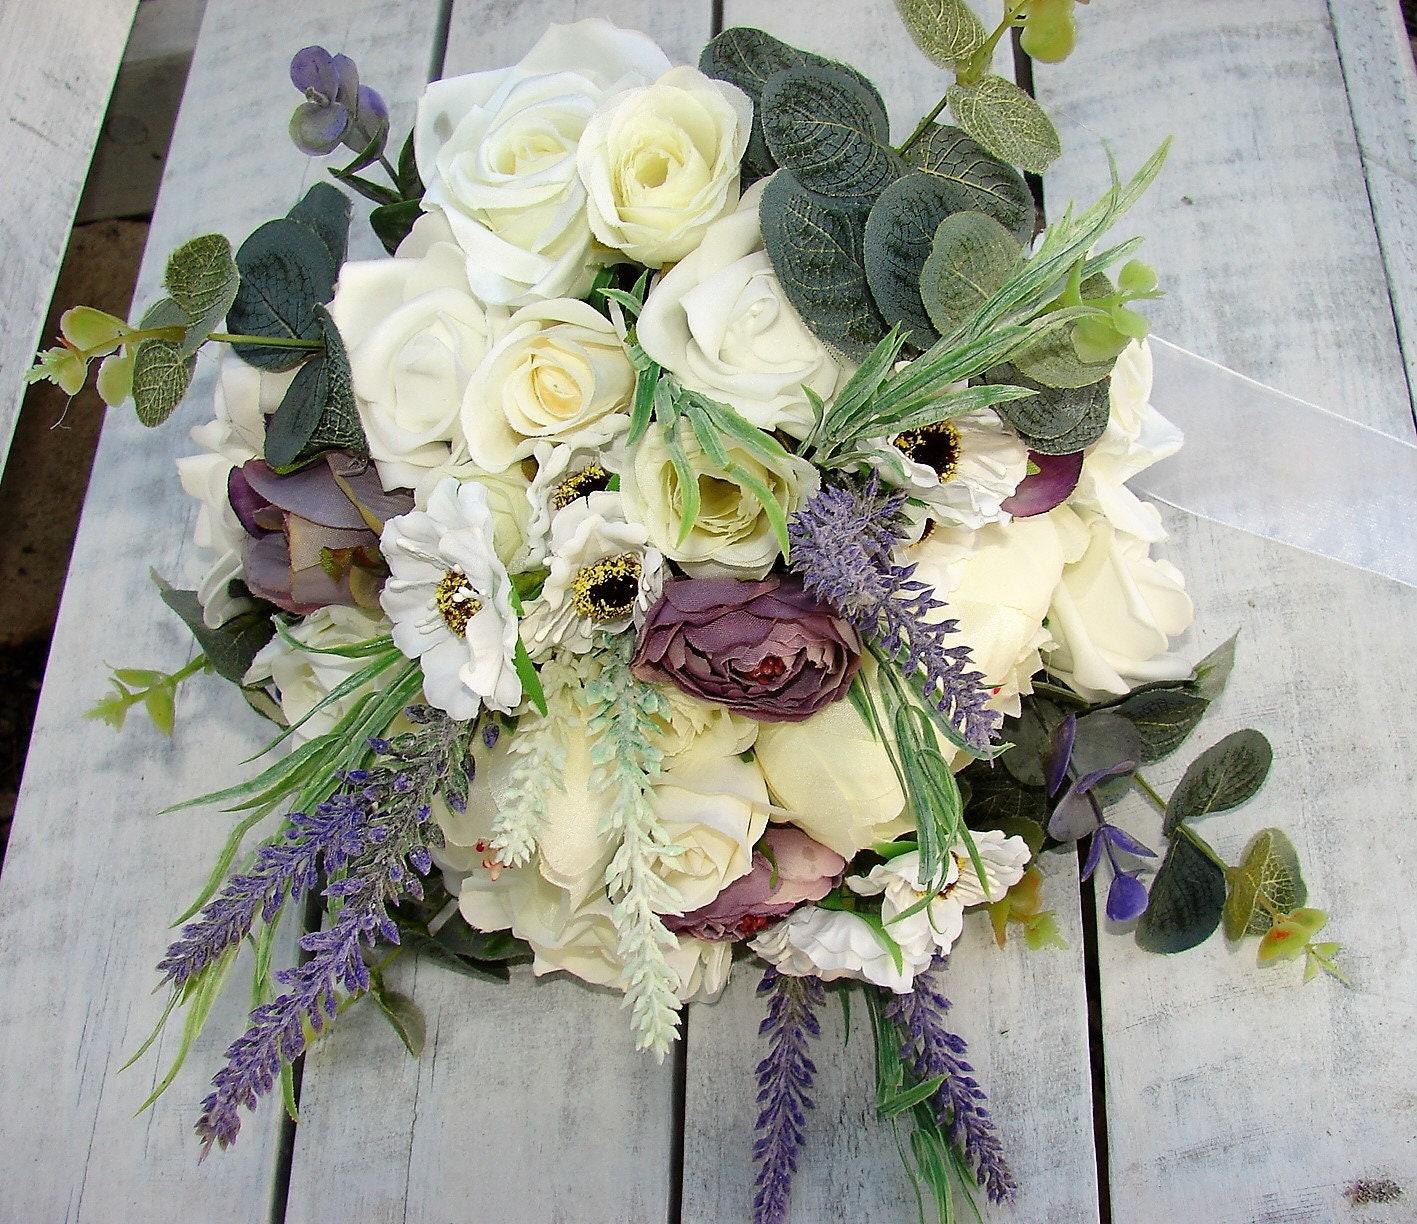 White lavender plum purple 8 piece rustic wedding bouquet set white lavender plum purple 8 piece rustic wedding bouquet set roses peonies daisies gum leaves lace boho artificial flowers izmirmasajfo